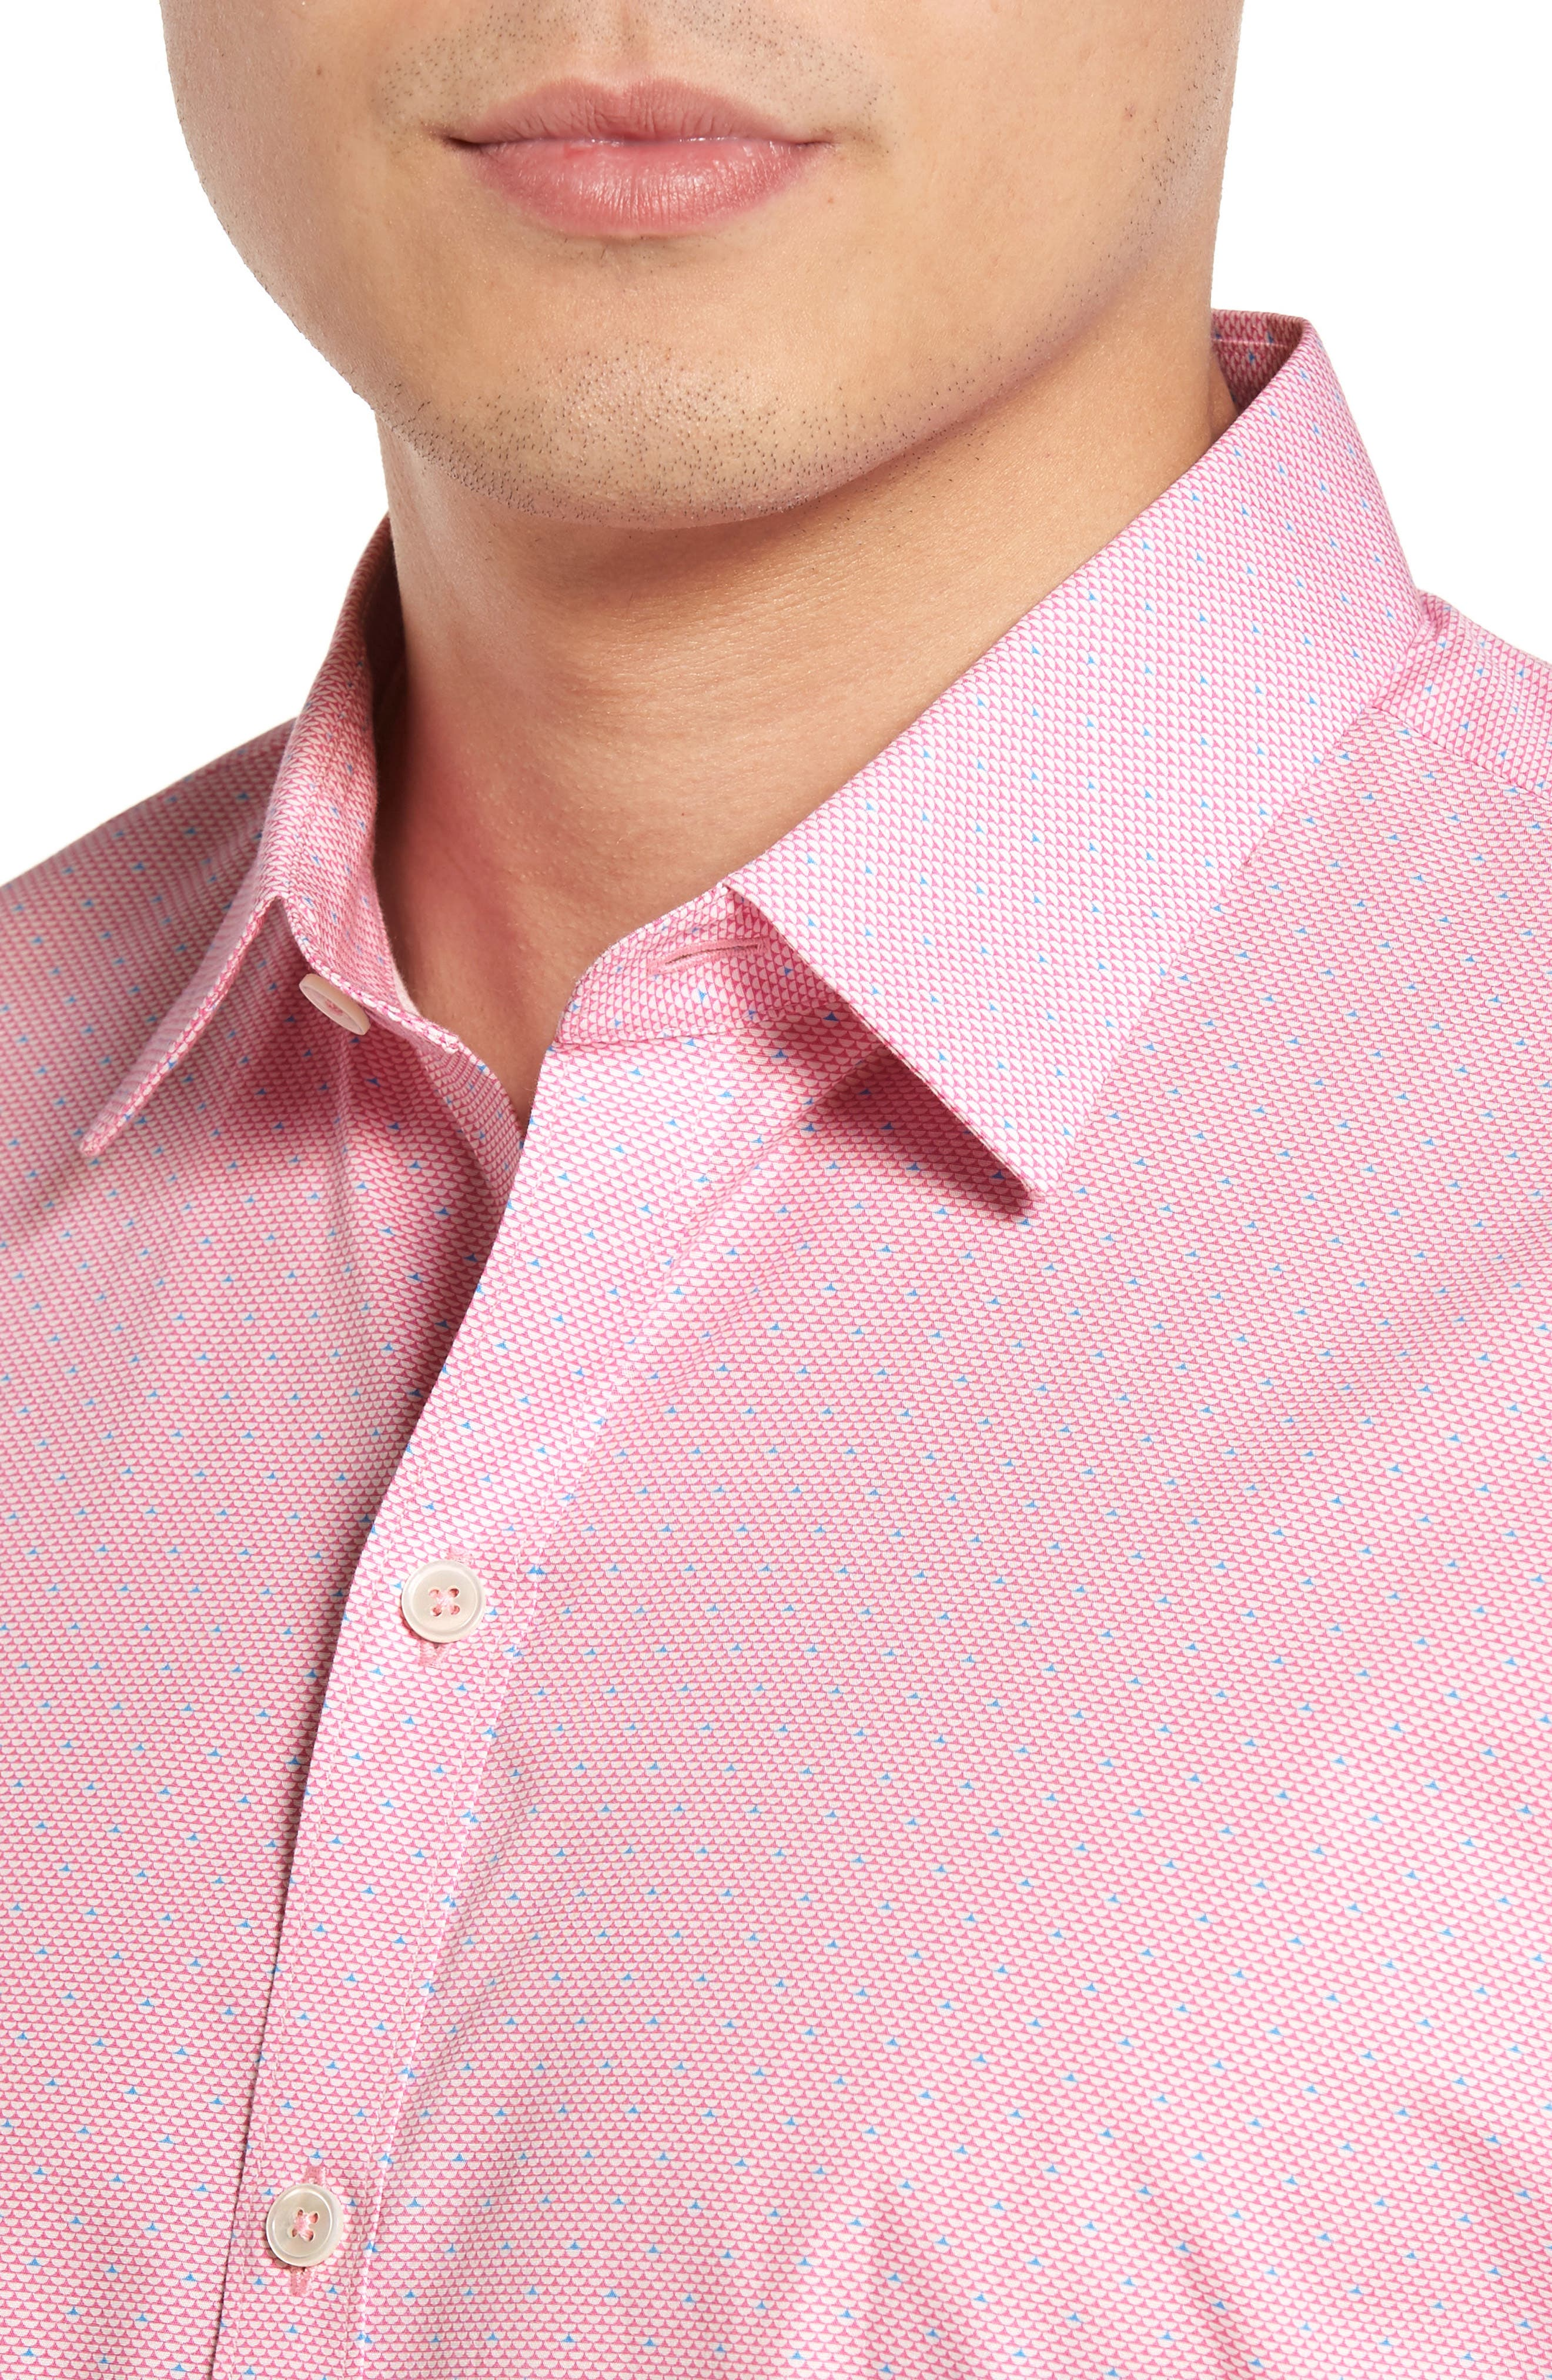 Dardano Trim Fit Print Sport Shirt,                             Alternate thumbnail 4, color,                             650